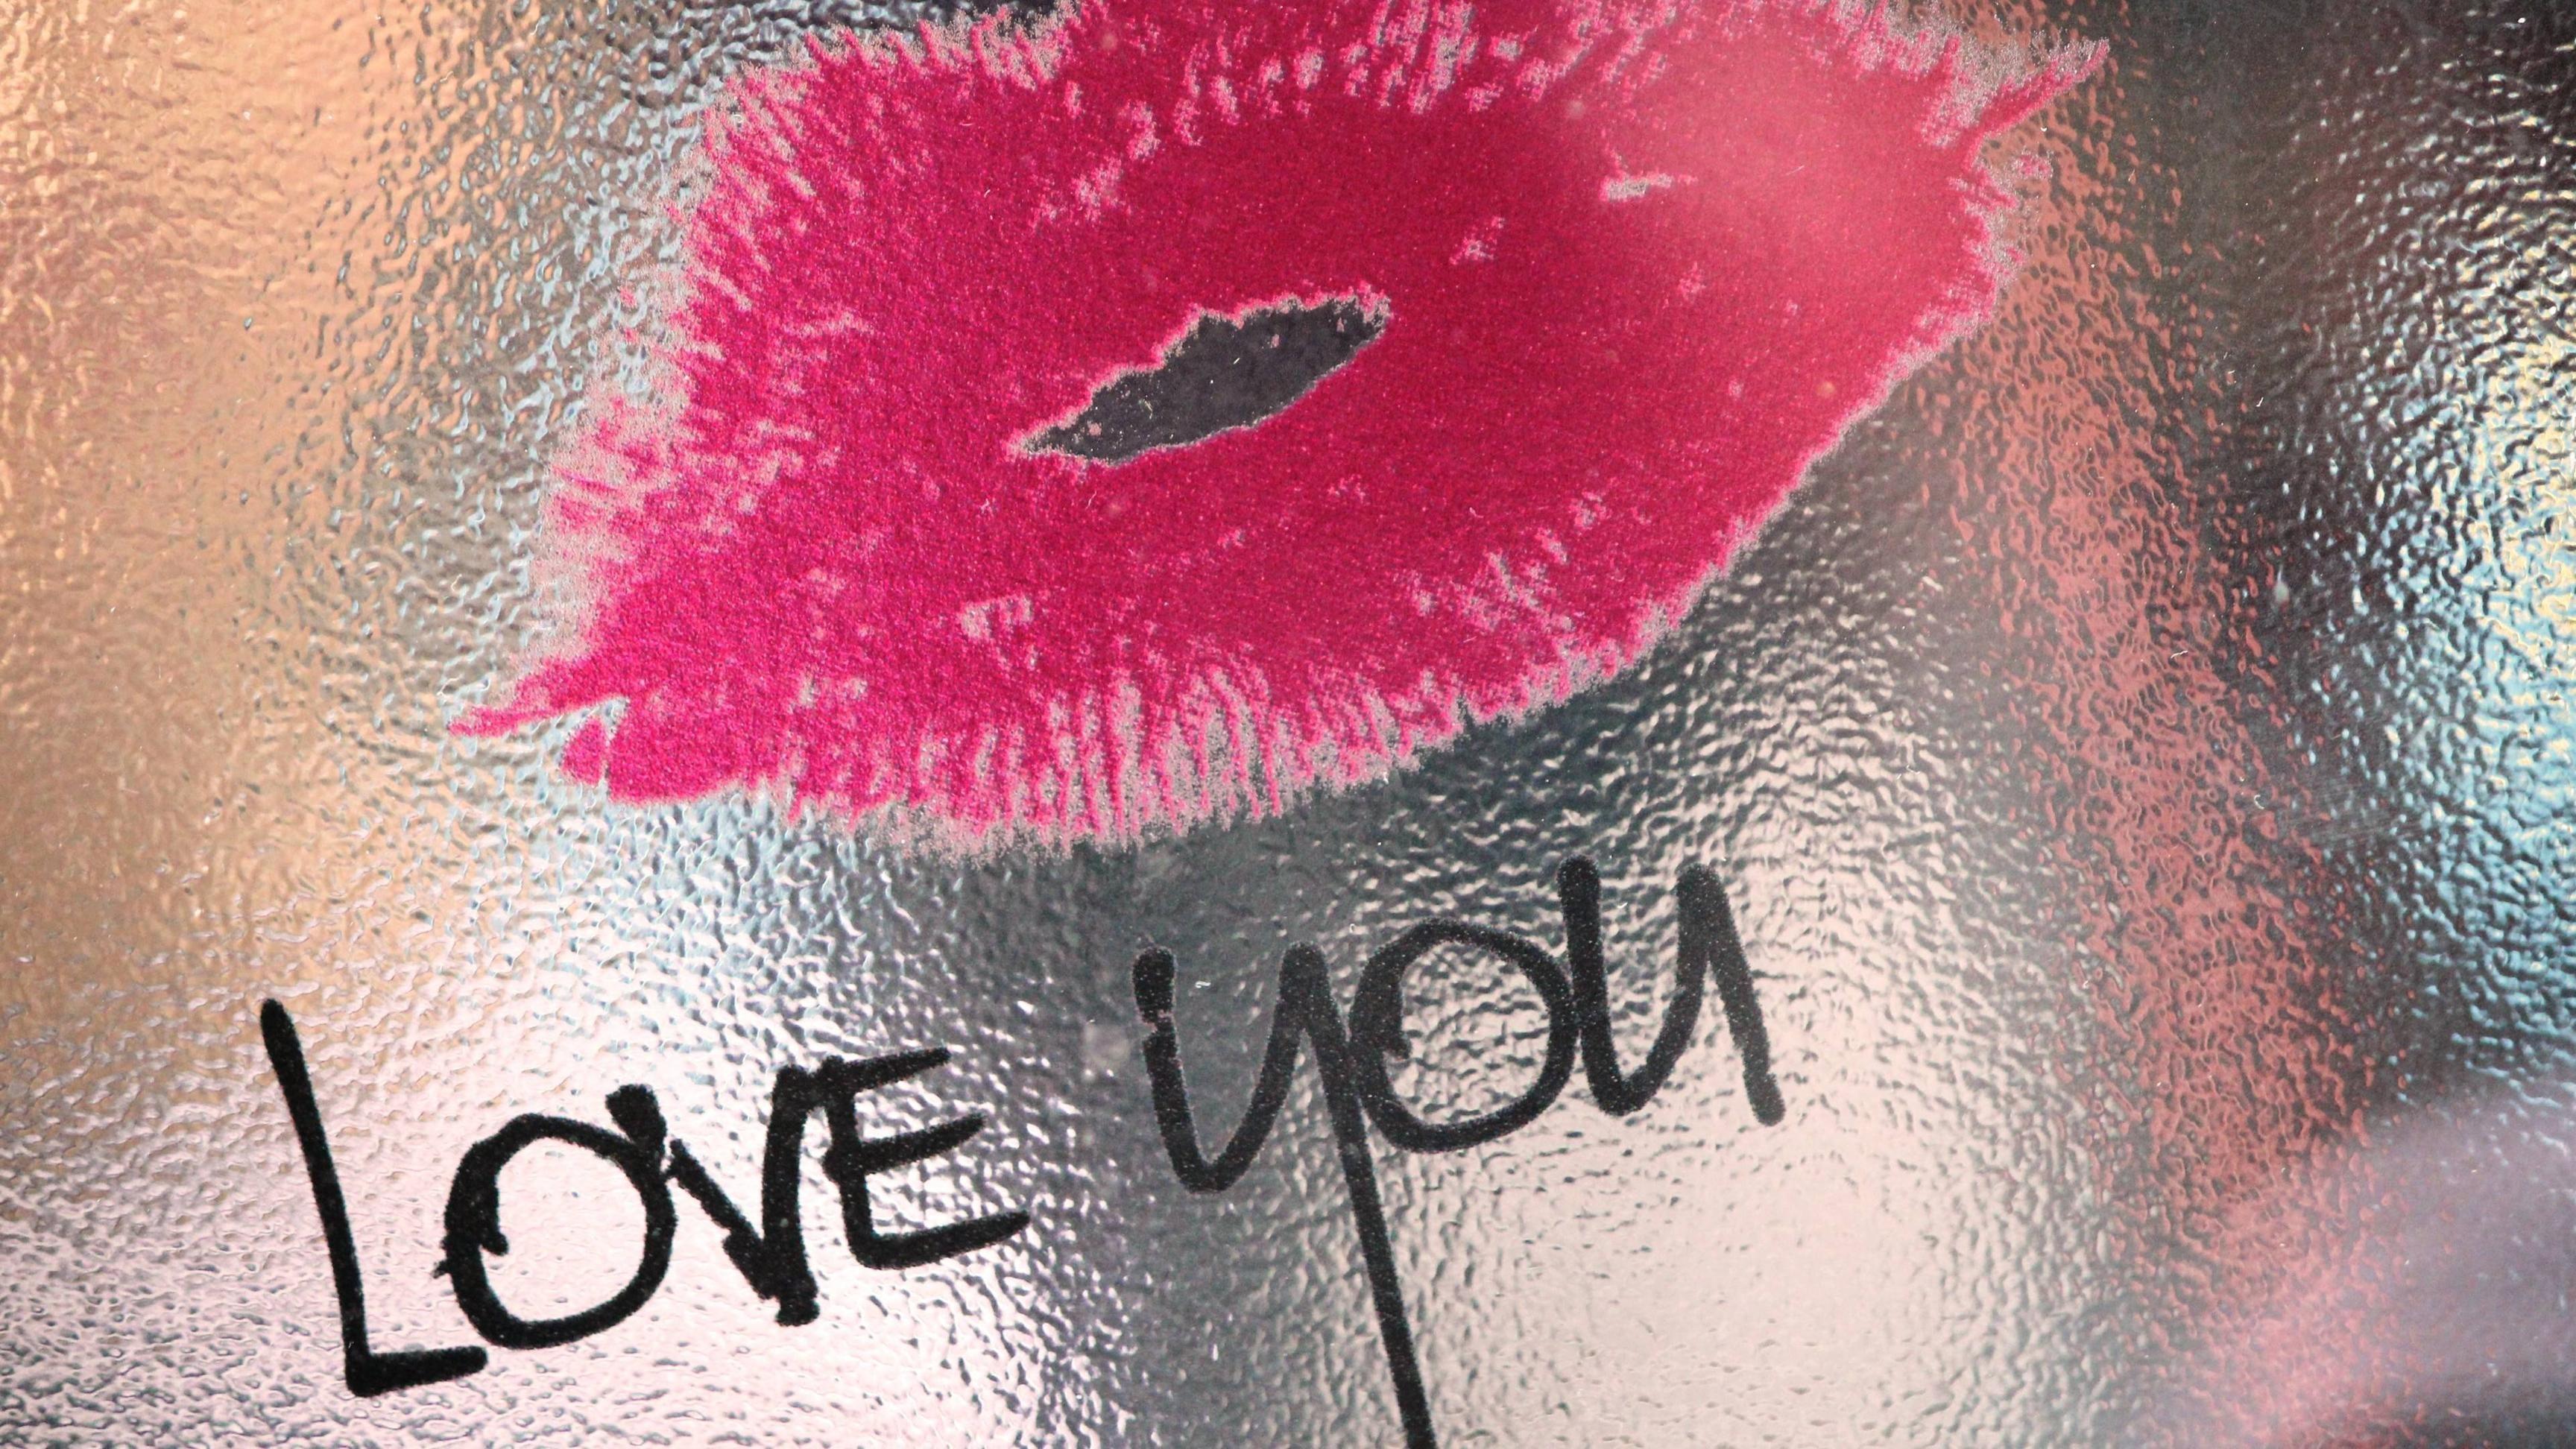 Kiss Wallpaper And Screensavers 66 Images